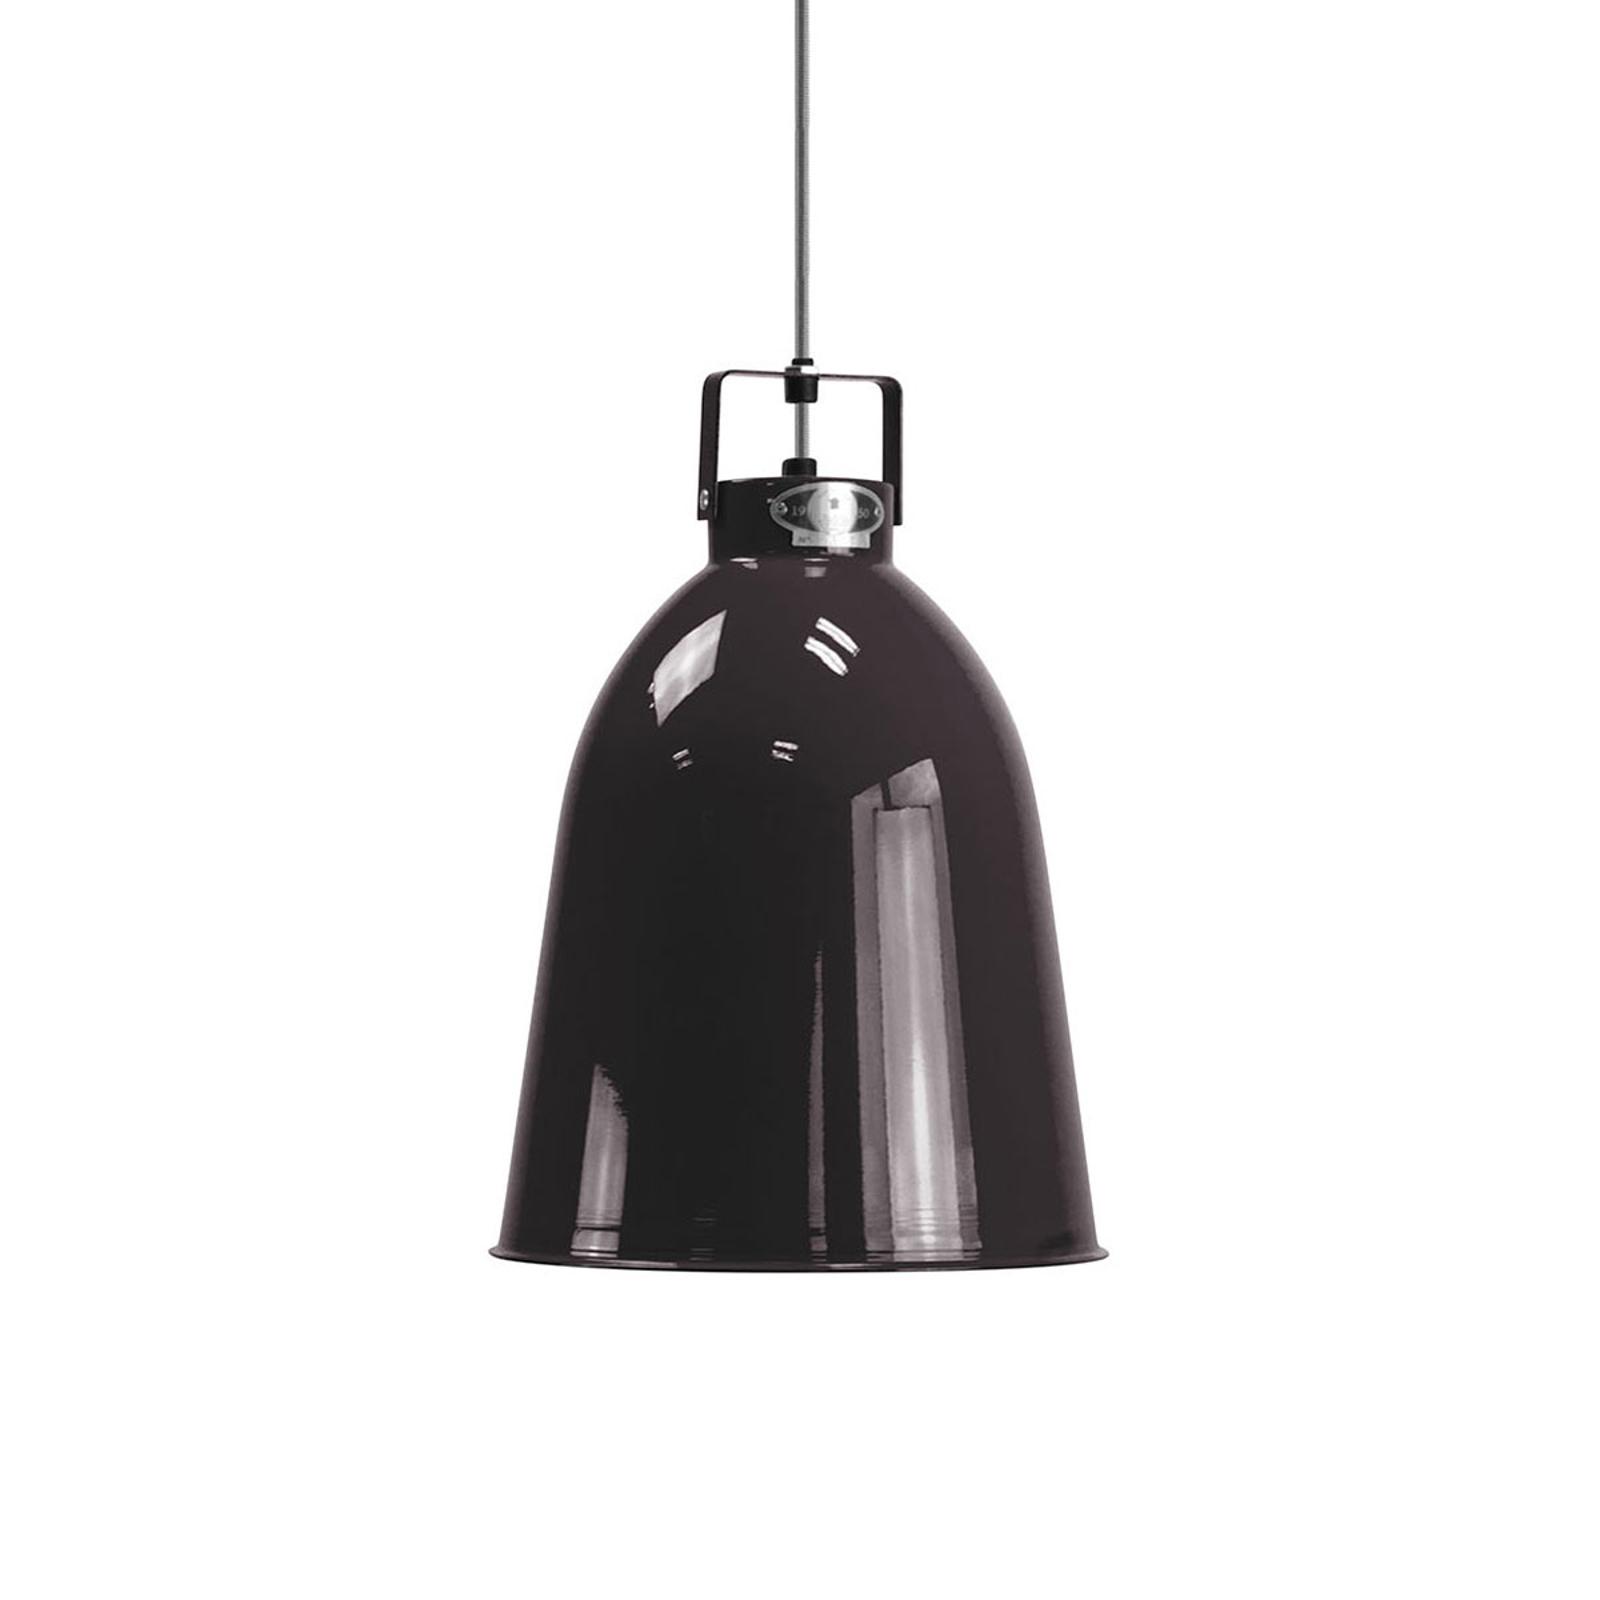 Jieldé Clément C240 Hängelampe schwarz glanz Ø24cm